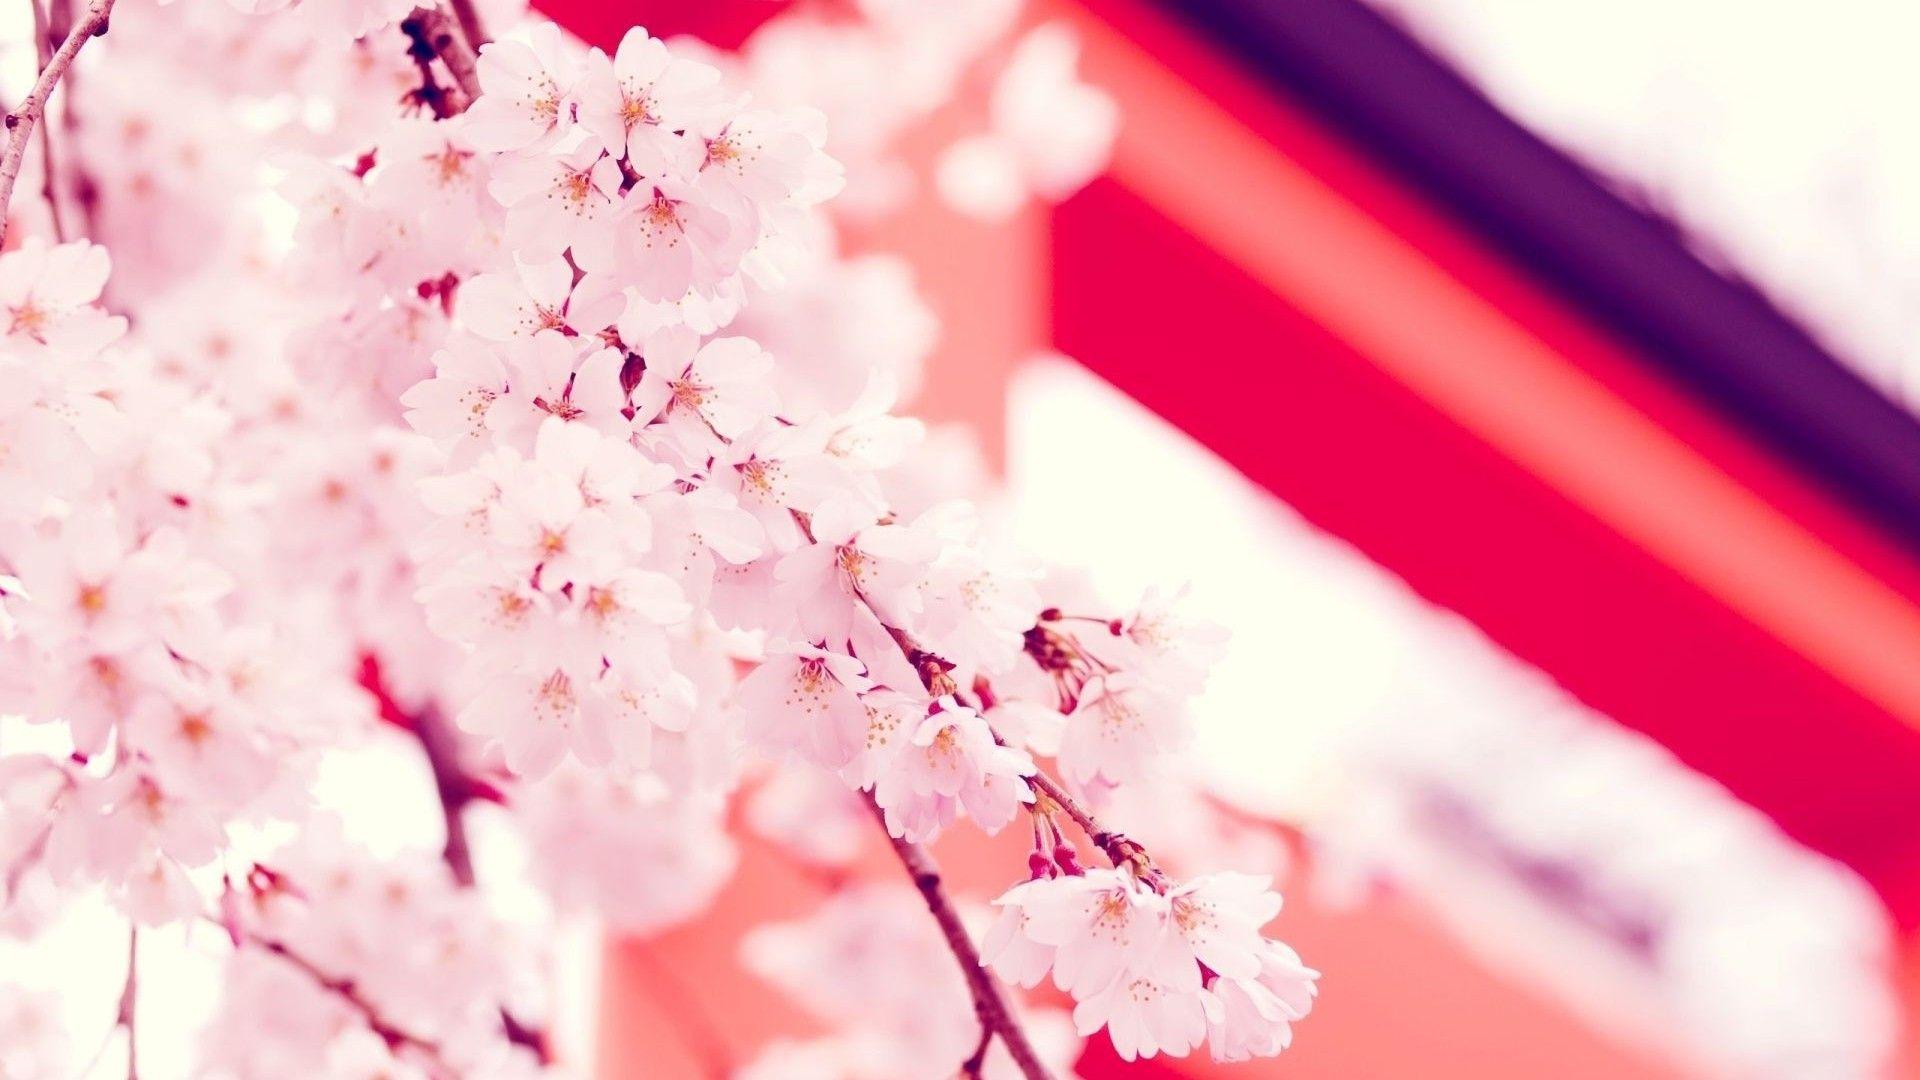 Free HD photos cherry blossom